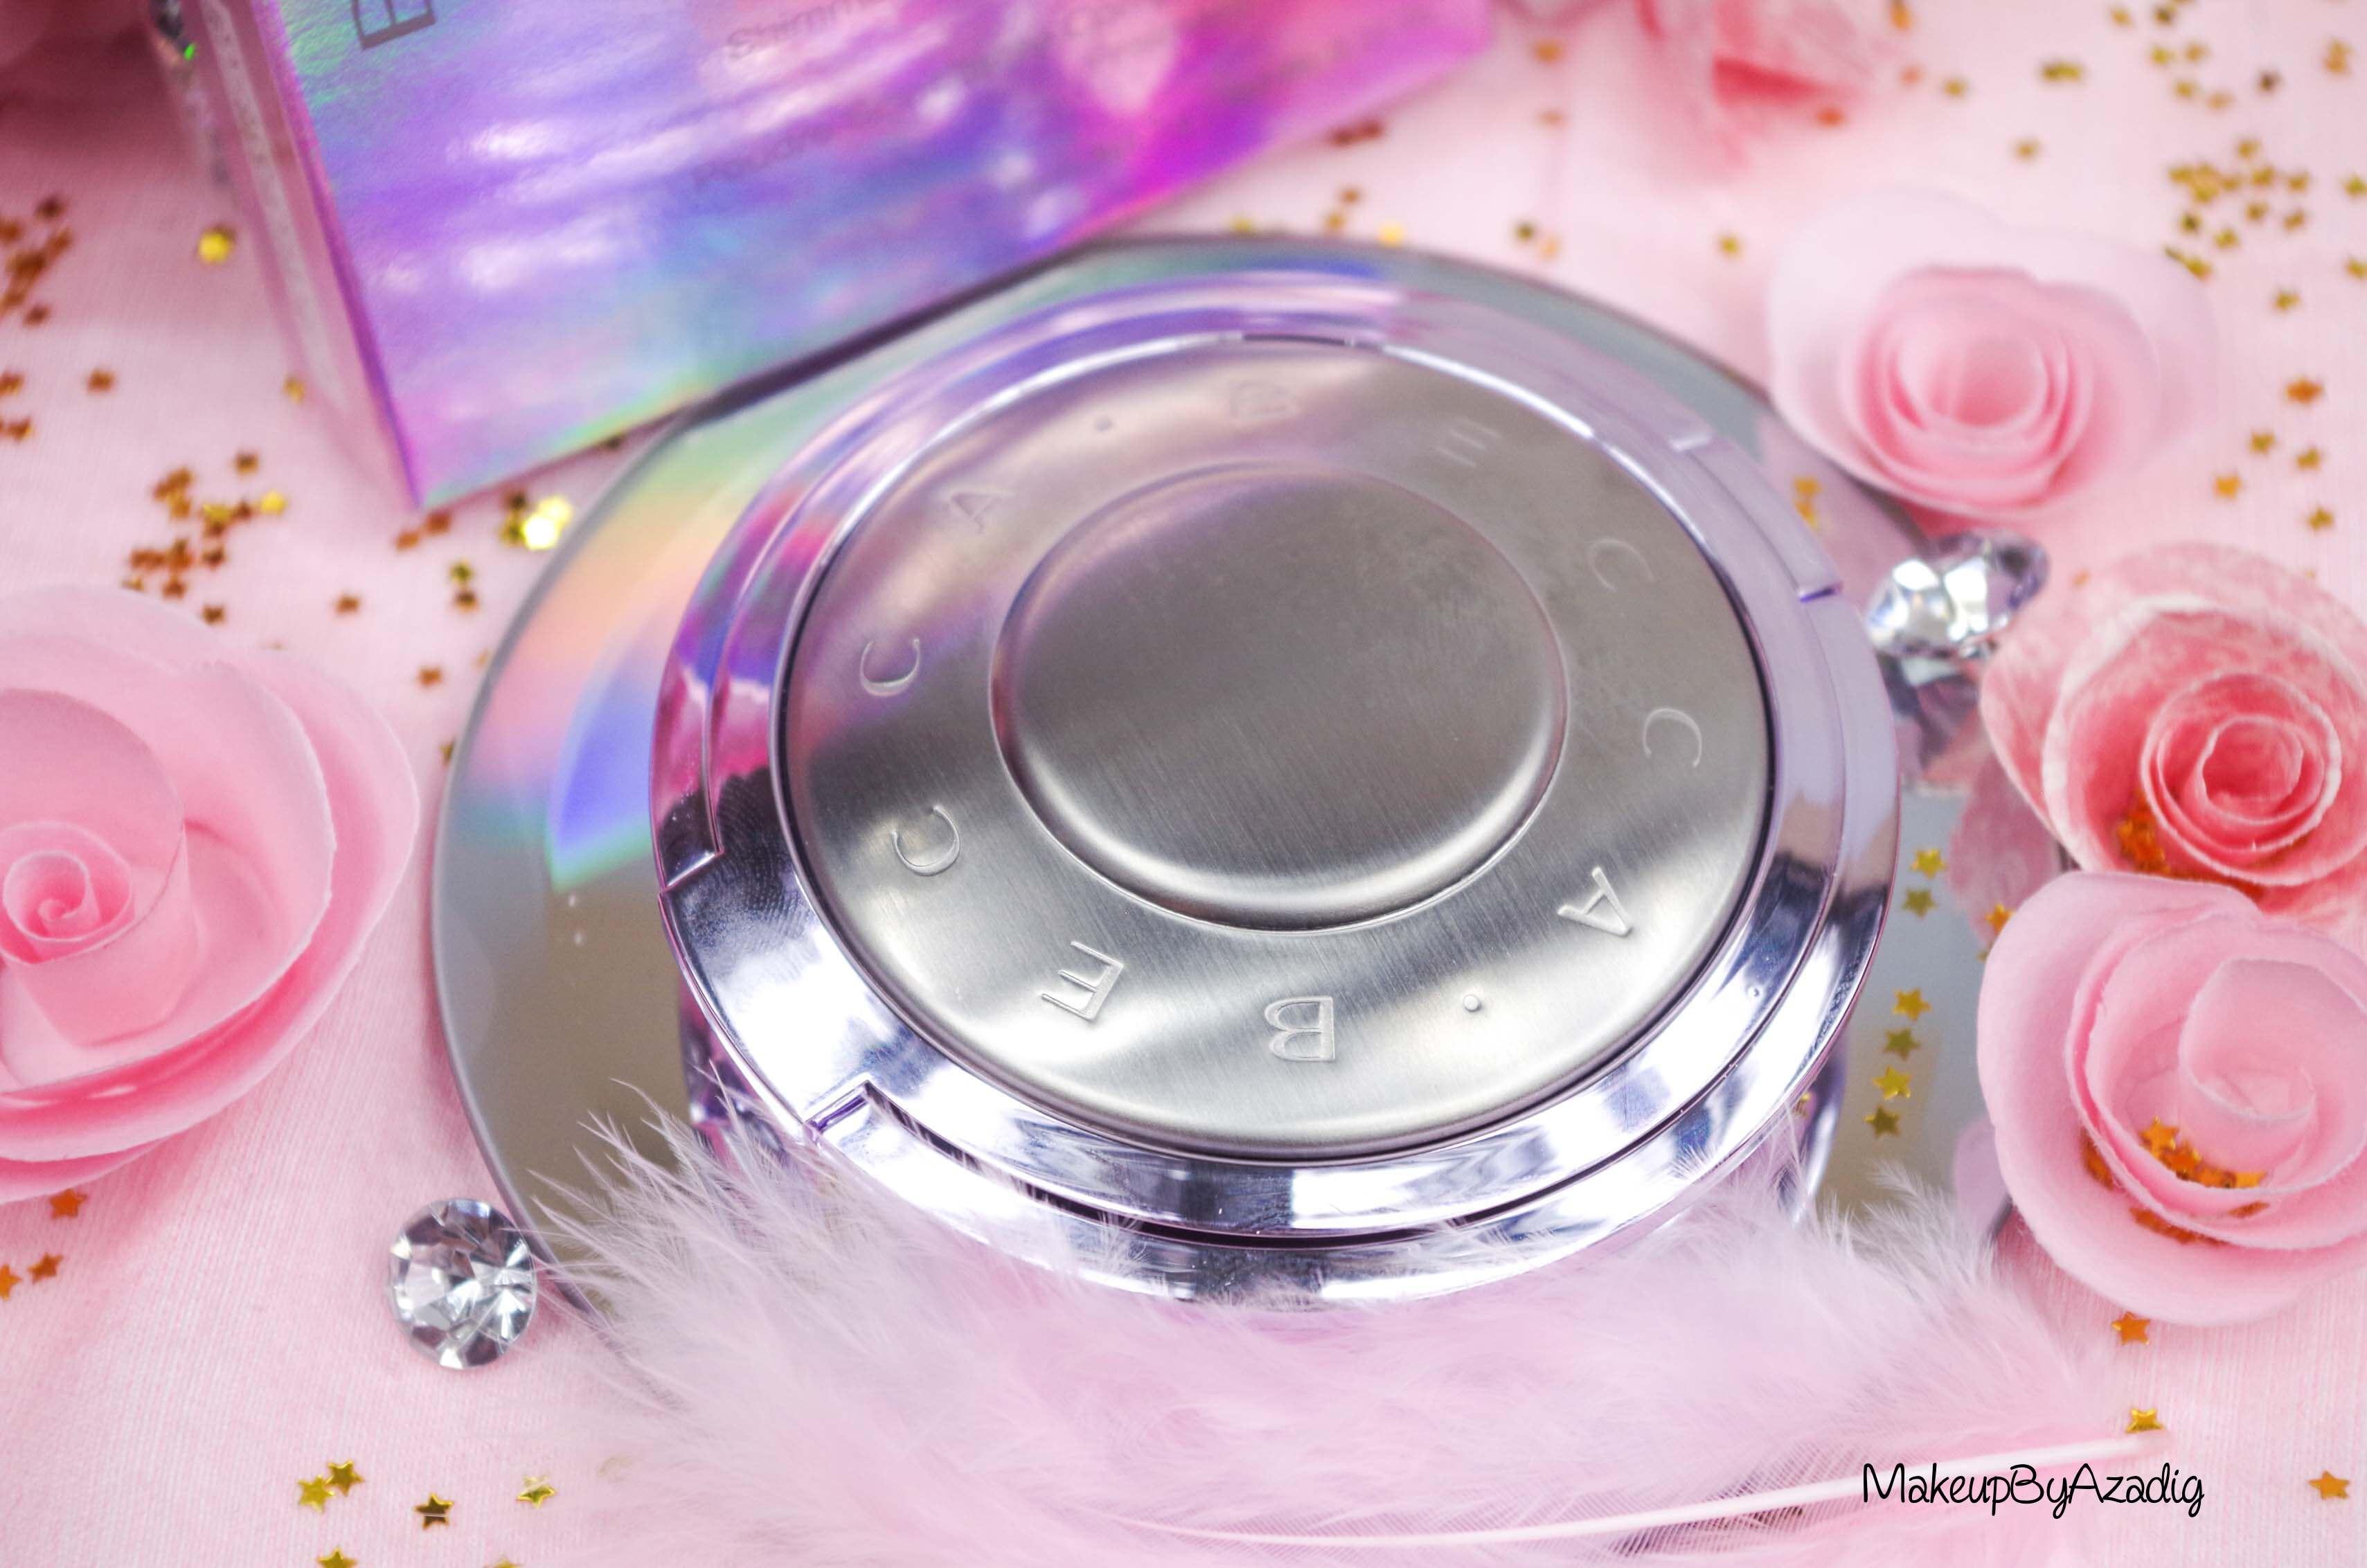 revue-becca-shimmering-skin-perfector-pressed-highlighter-enlumineur-violet-prismatic-amethyst-avis-swatch-prix-makeupbyazadig-luxe